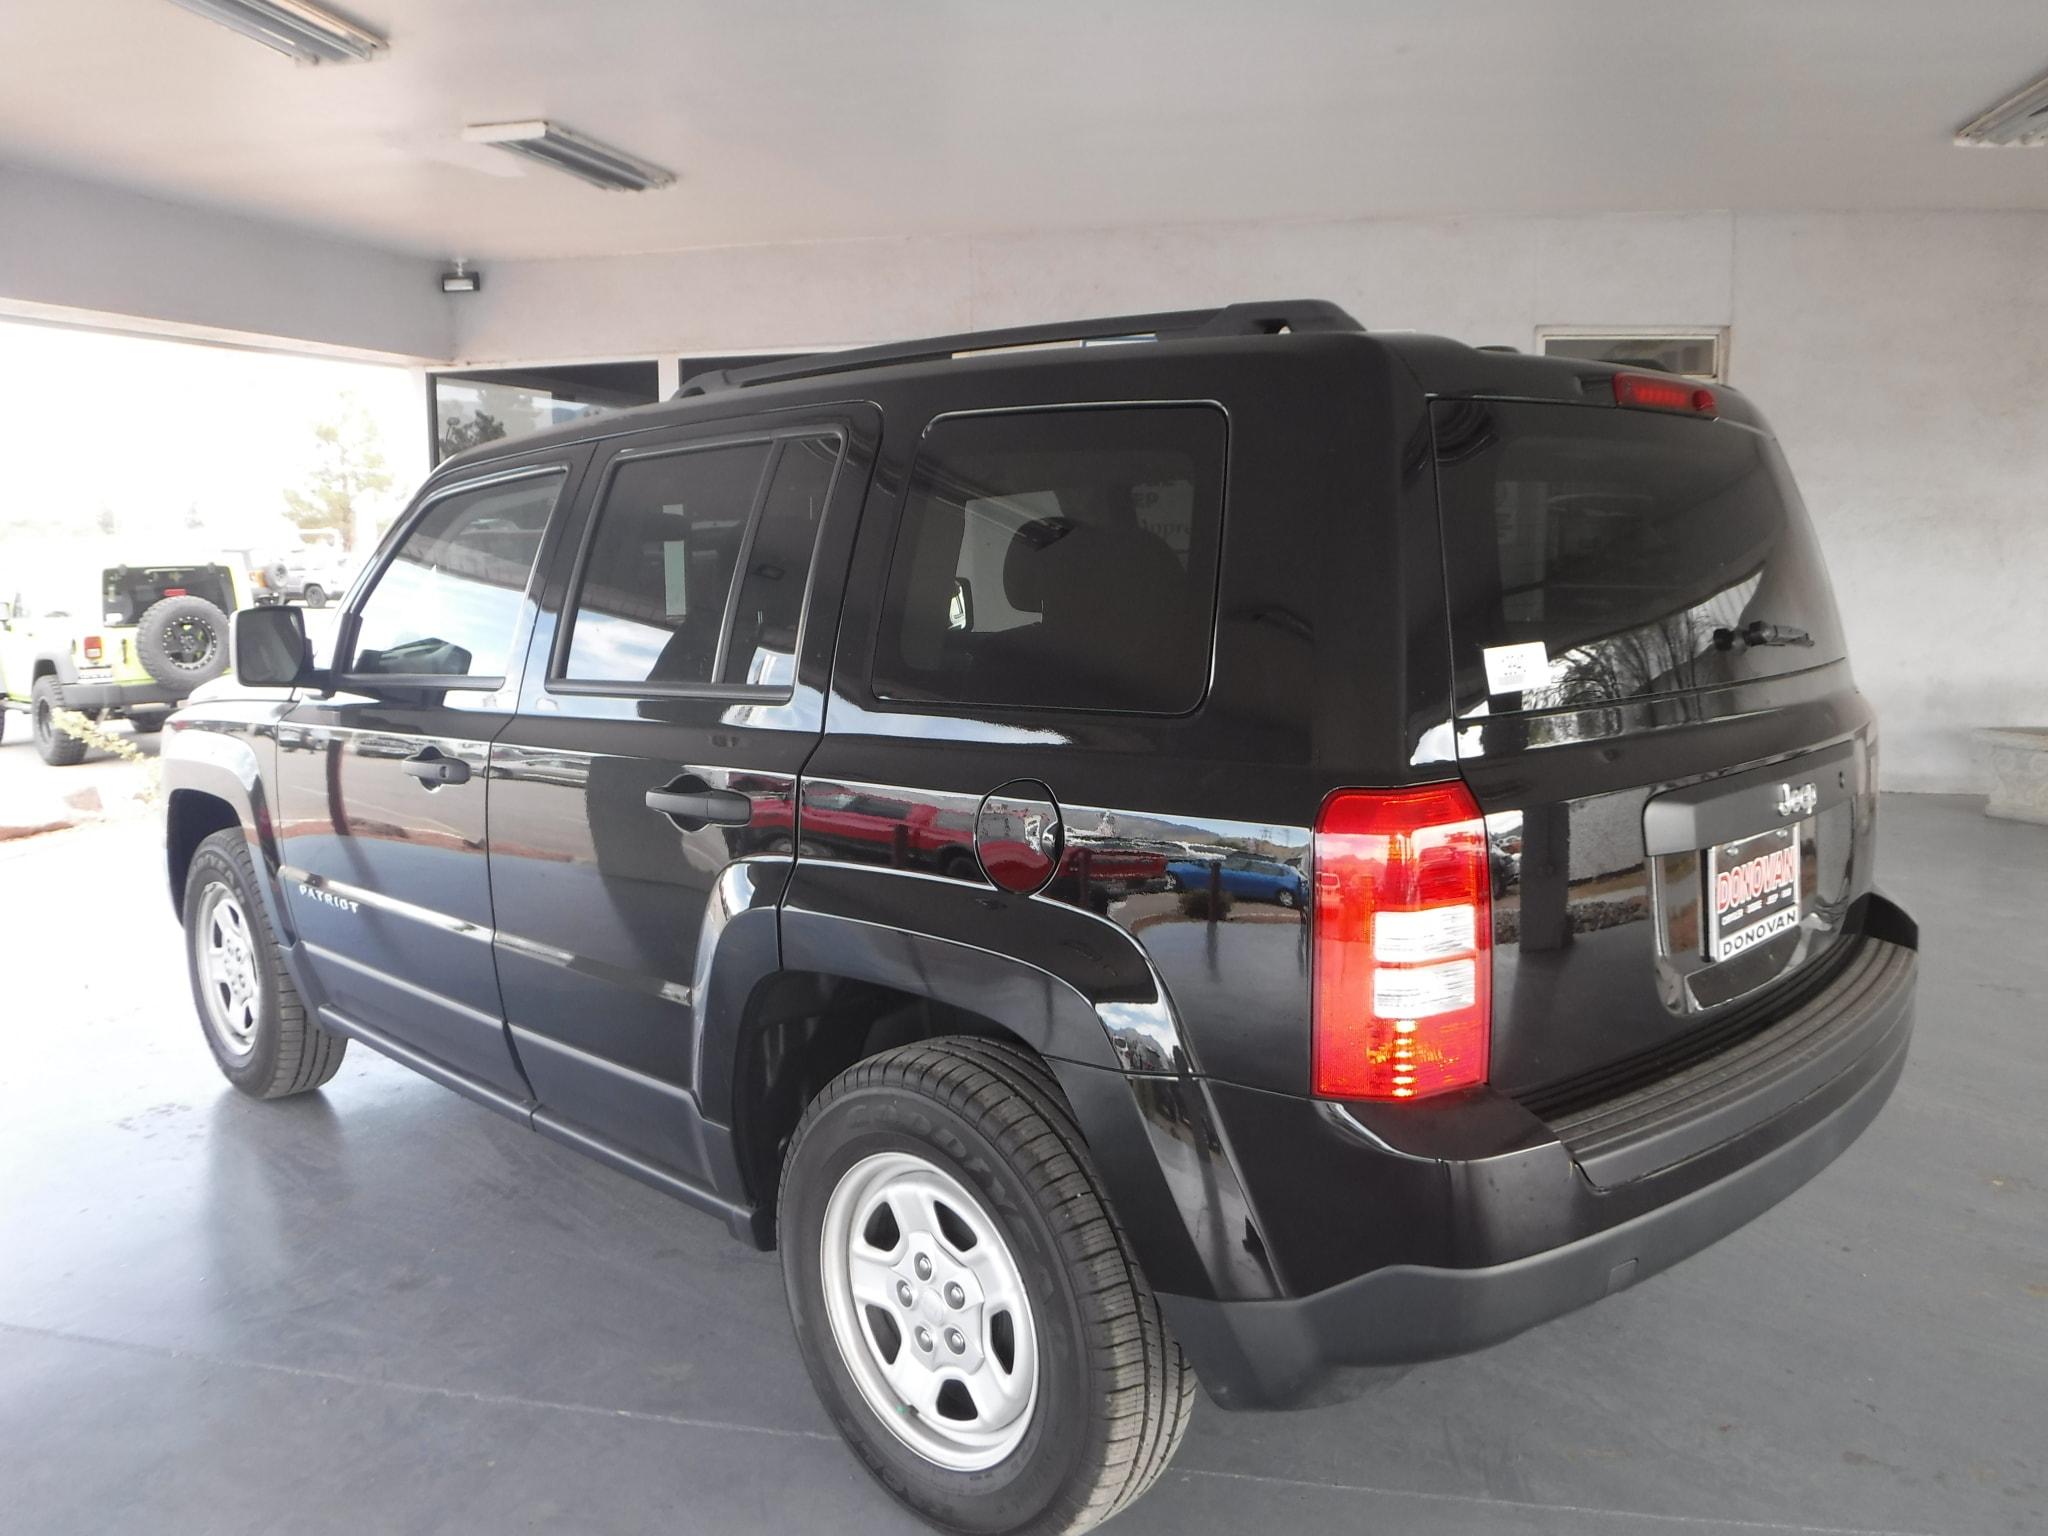 used 2016 jeep patriot sport for sale in sierra vista az near benson az 1c4njpbb5gd777612. Black Bedroom Furniture Sets. Home Design Ideas